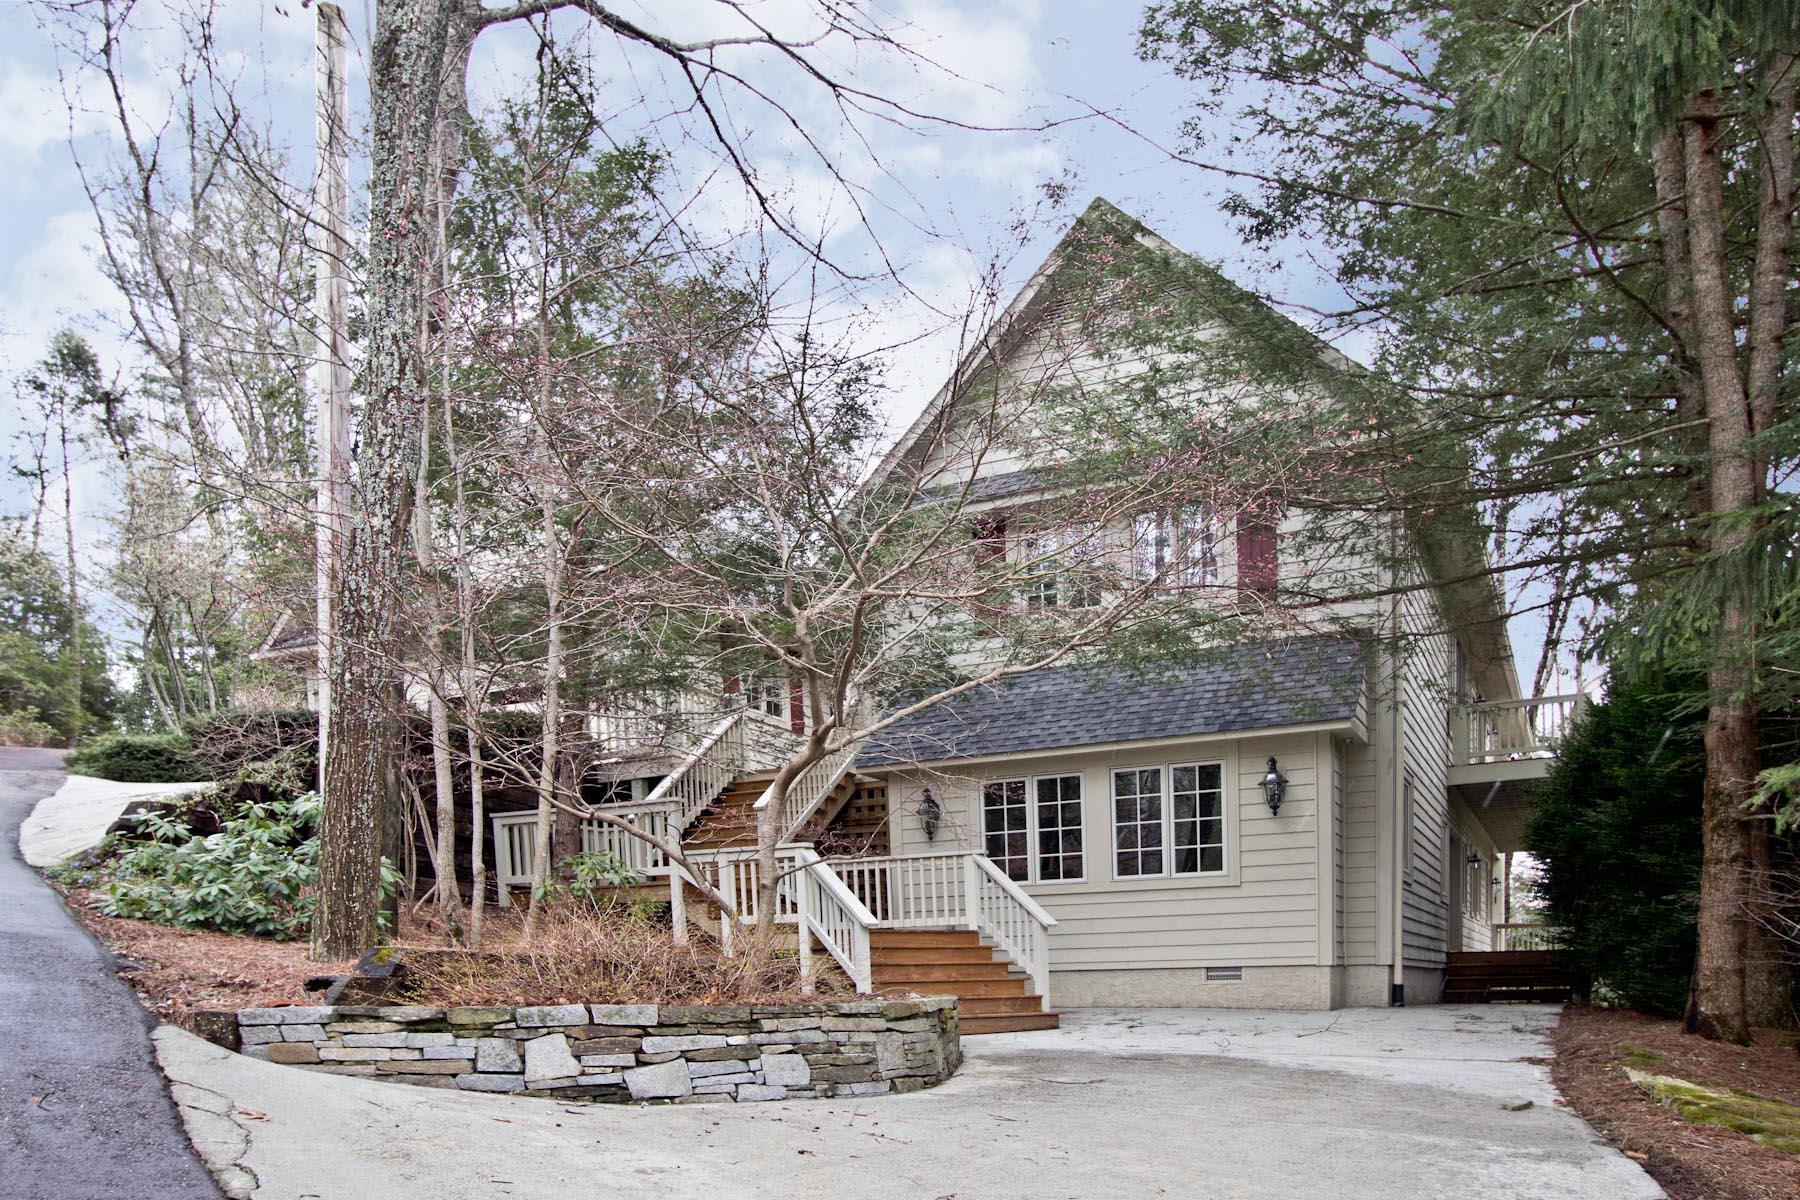 Single Family Home for Sale at 63 Azalea Road Highlands, North Carolina, 28741 United States